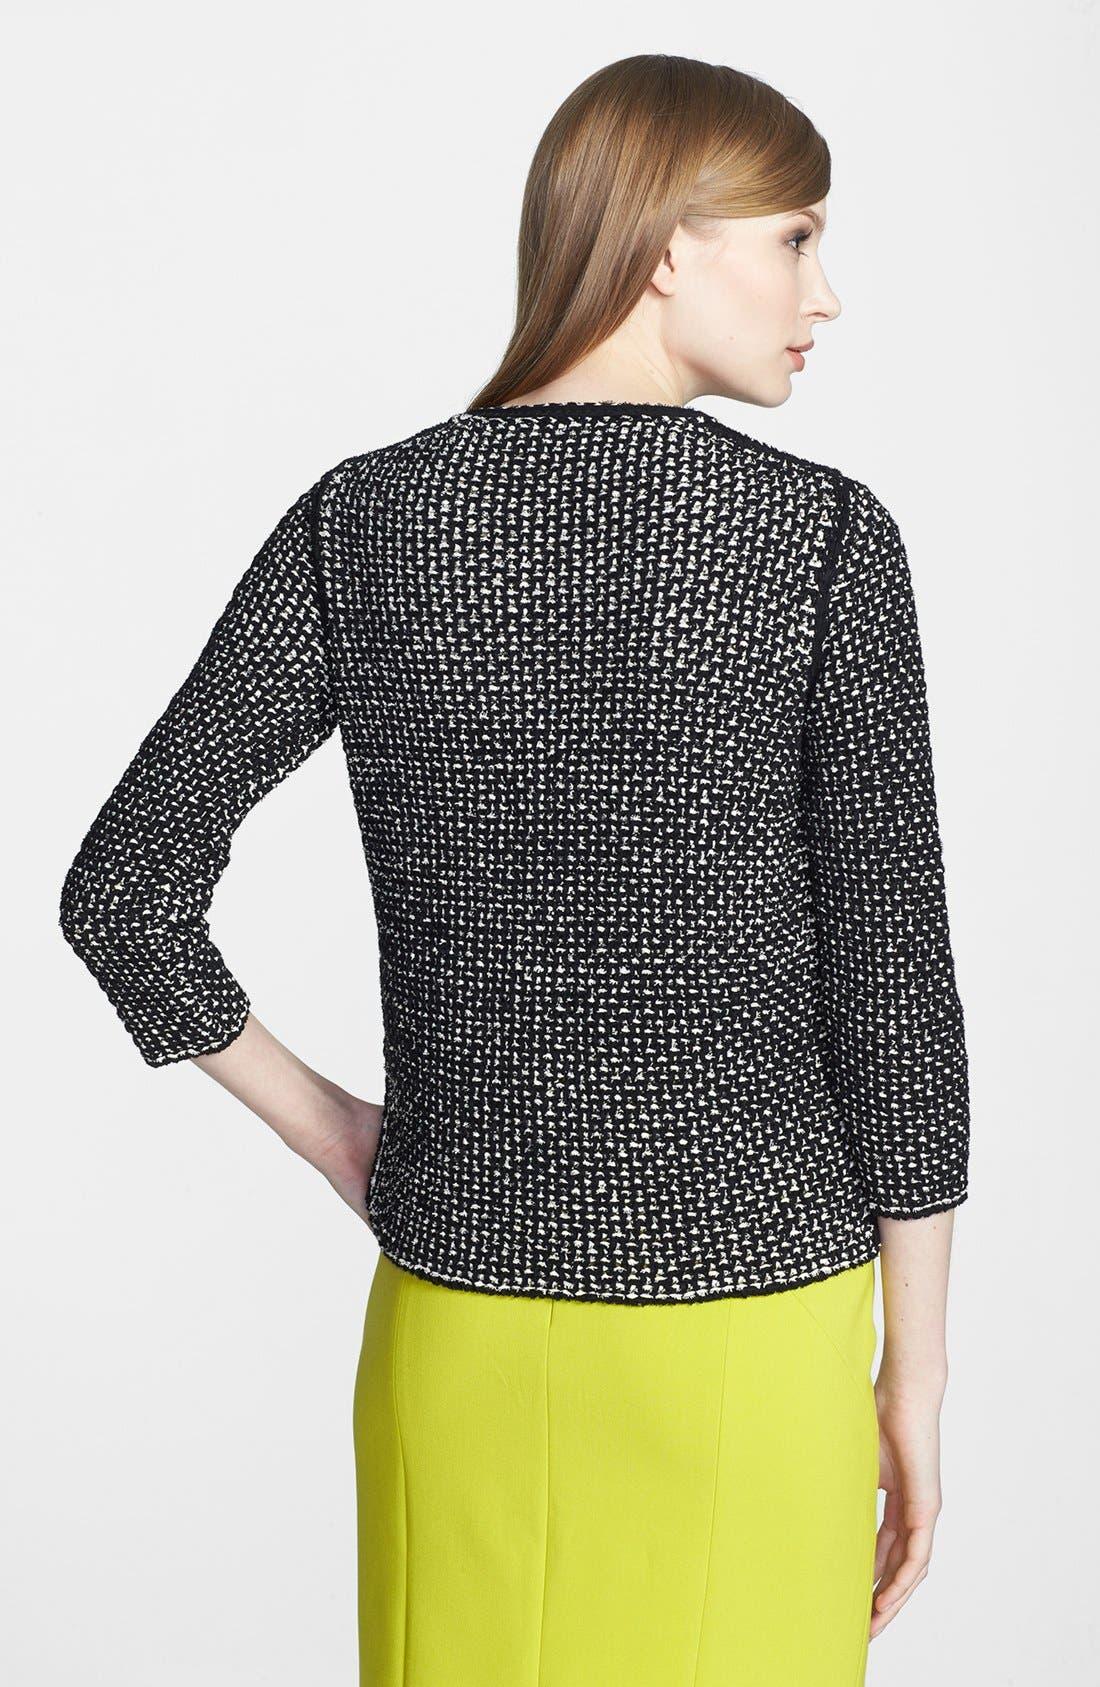 Alternate Image 2  - BOSS HUGO BOSS Cotton Blend Sweater Jacket